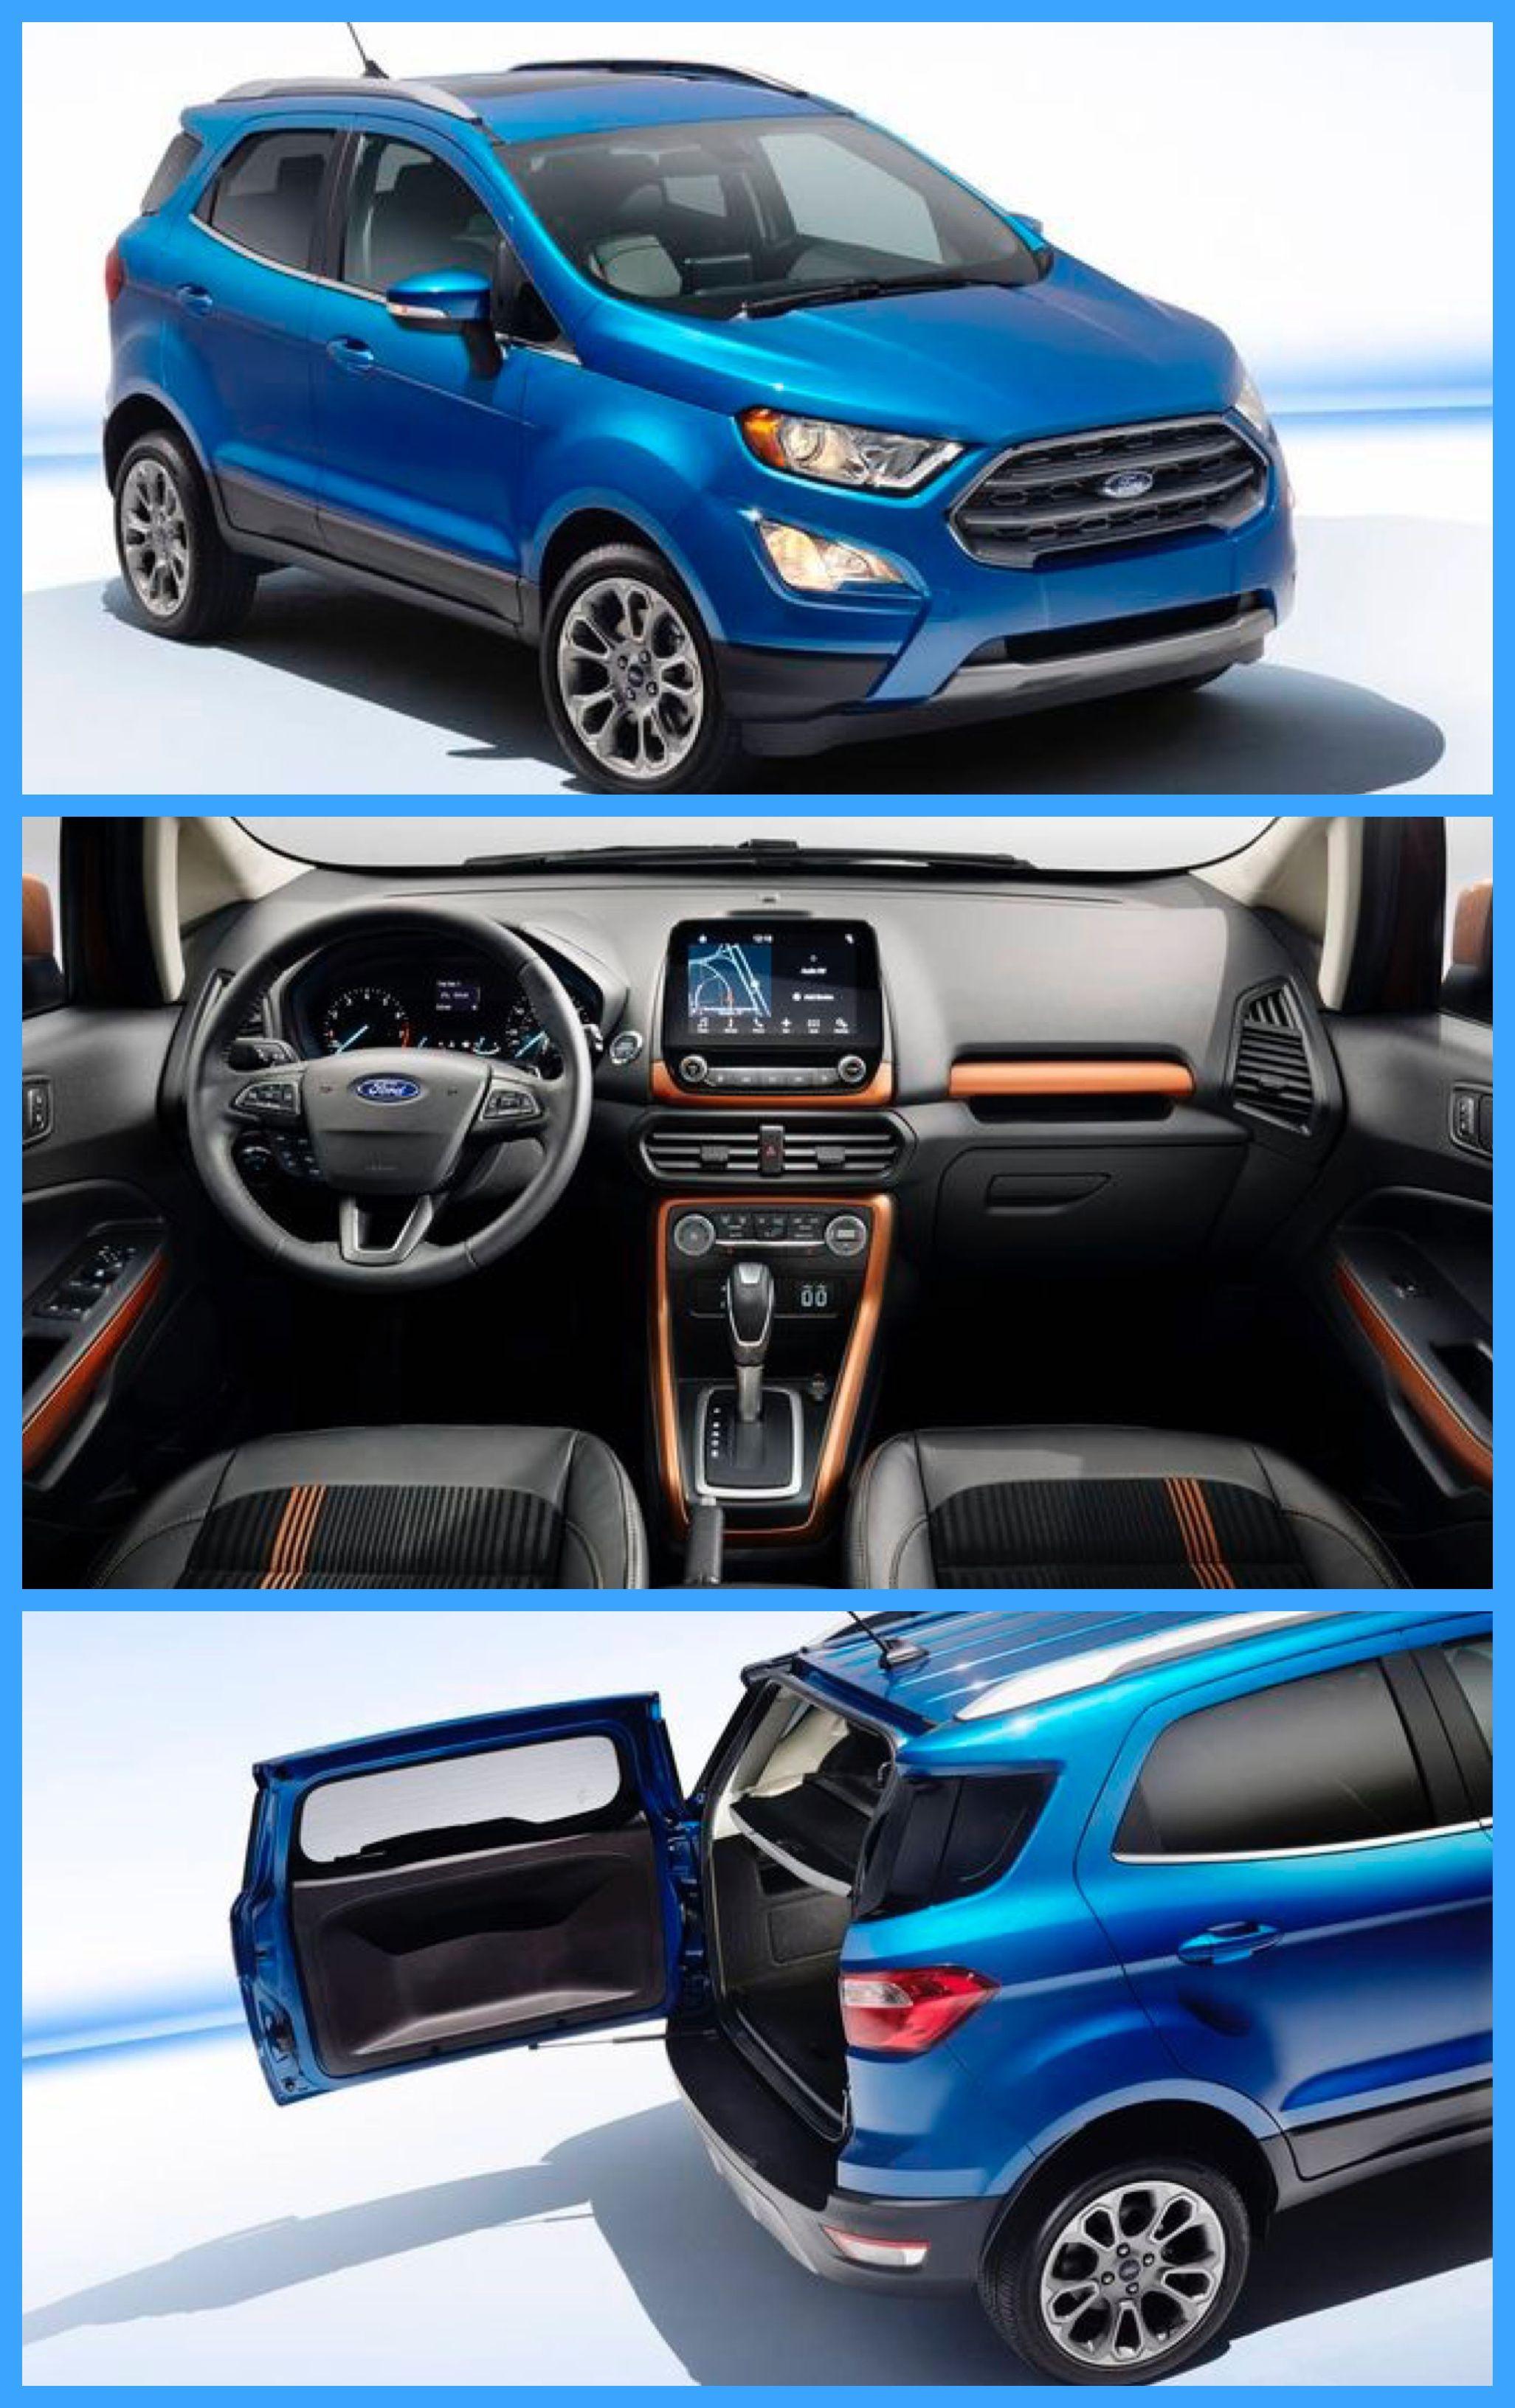 Ford Ecosport Mini Suv Suv Cars Ford Suv Ford Ecosport